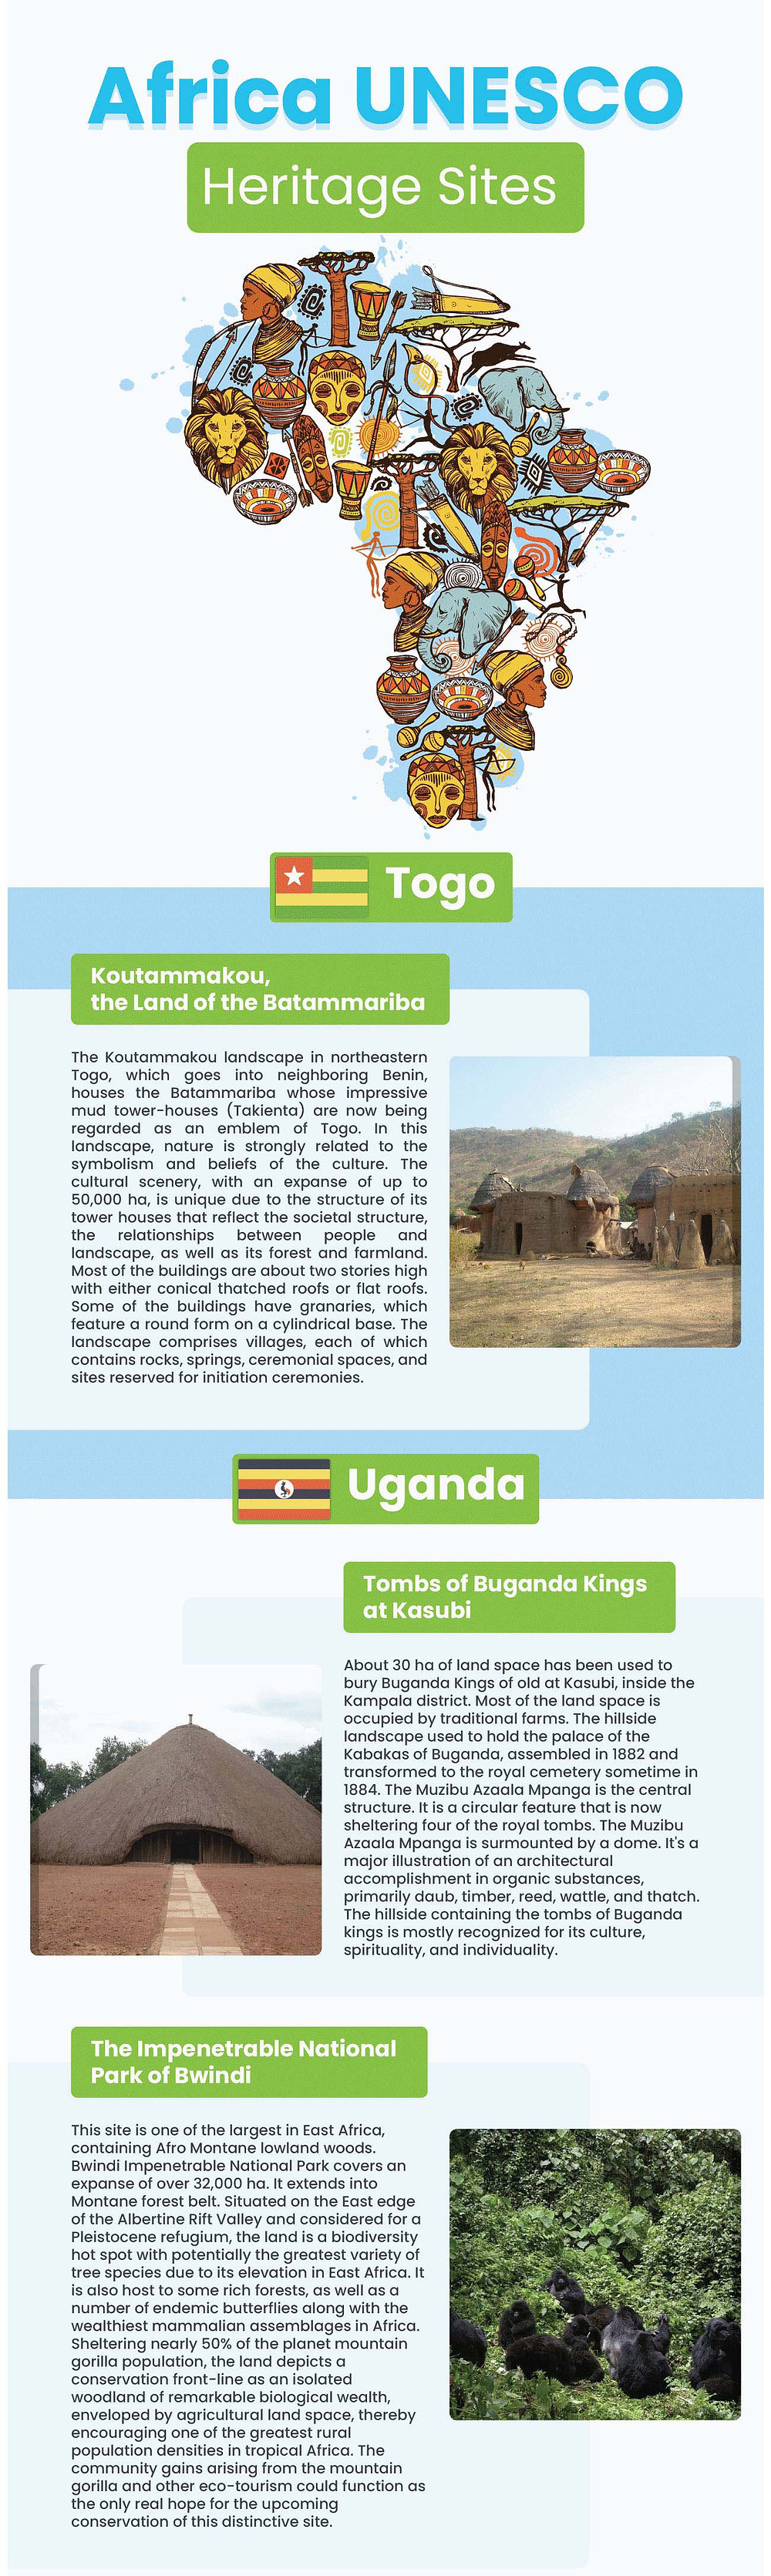 Africa UNESCO heritage sites